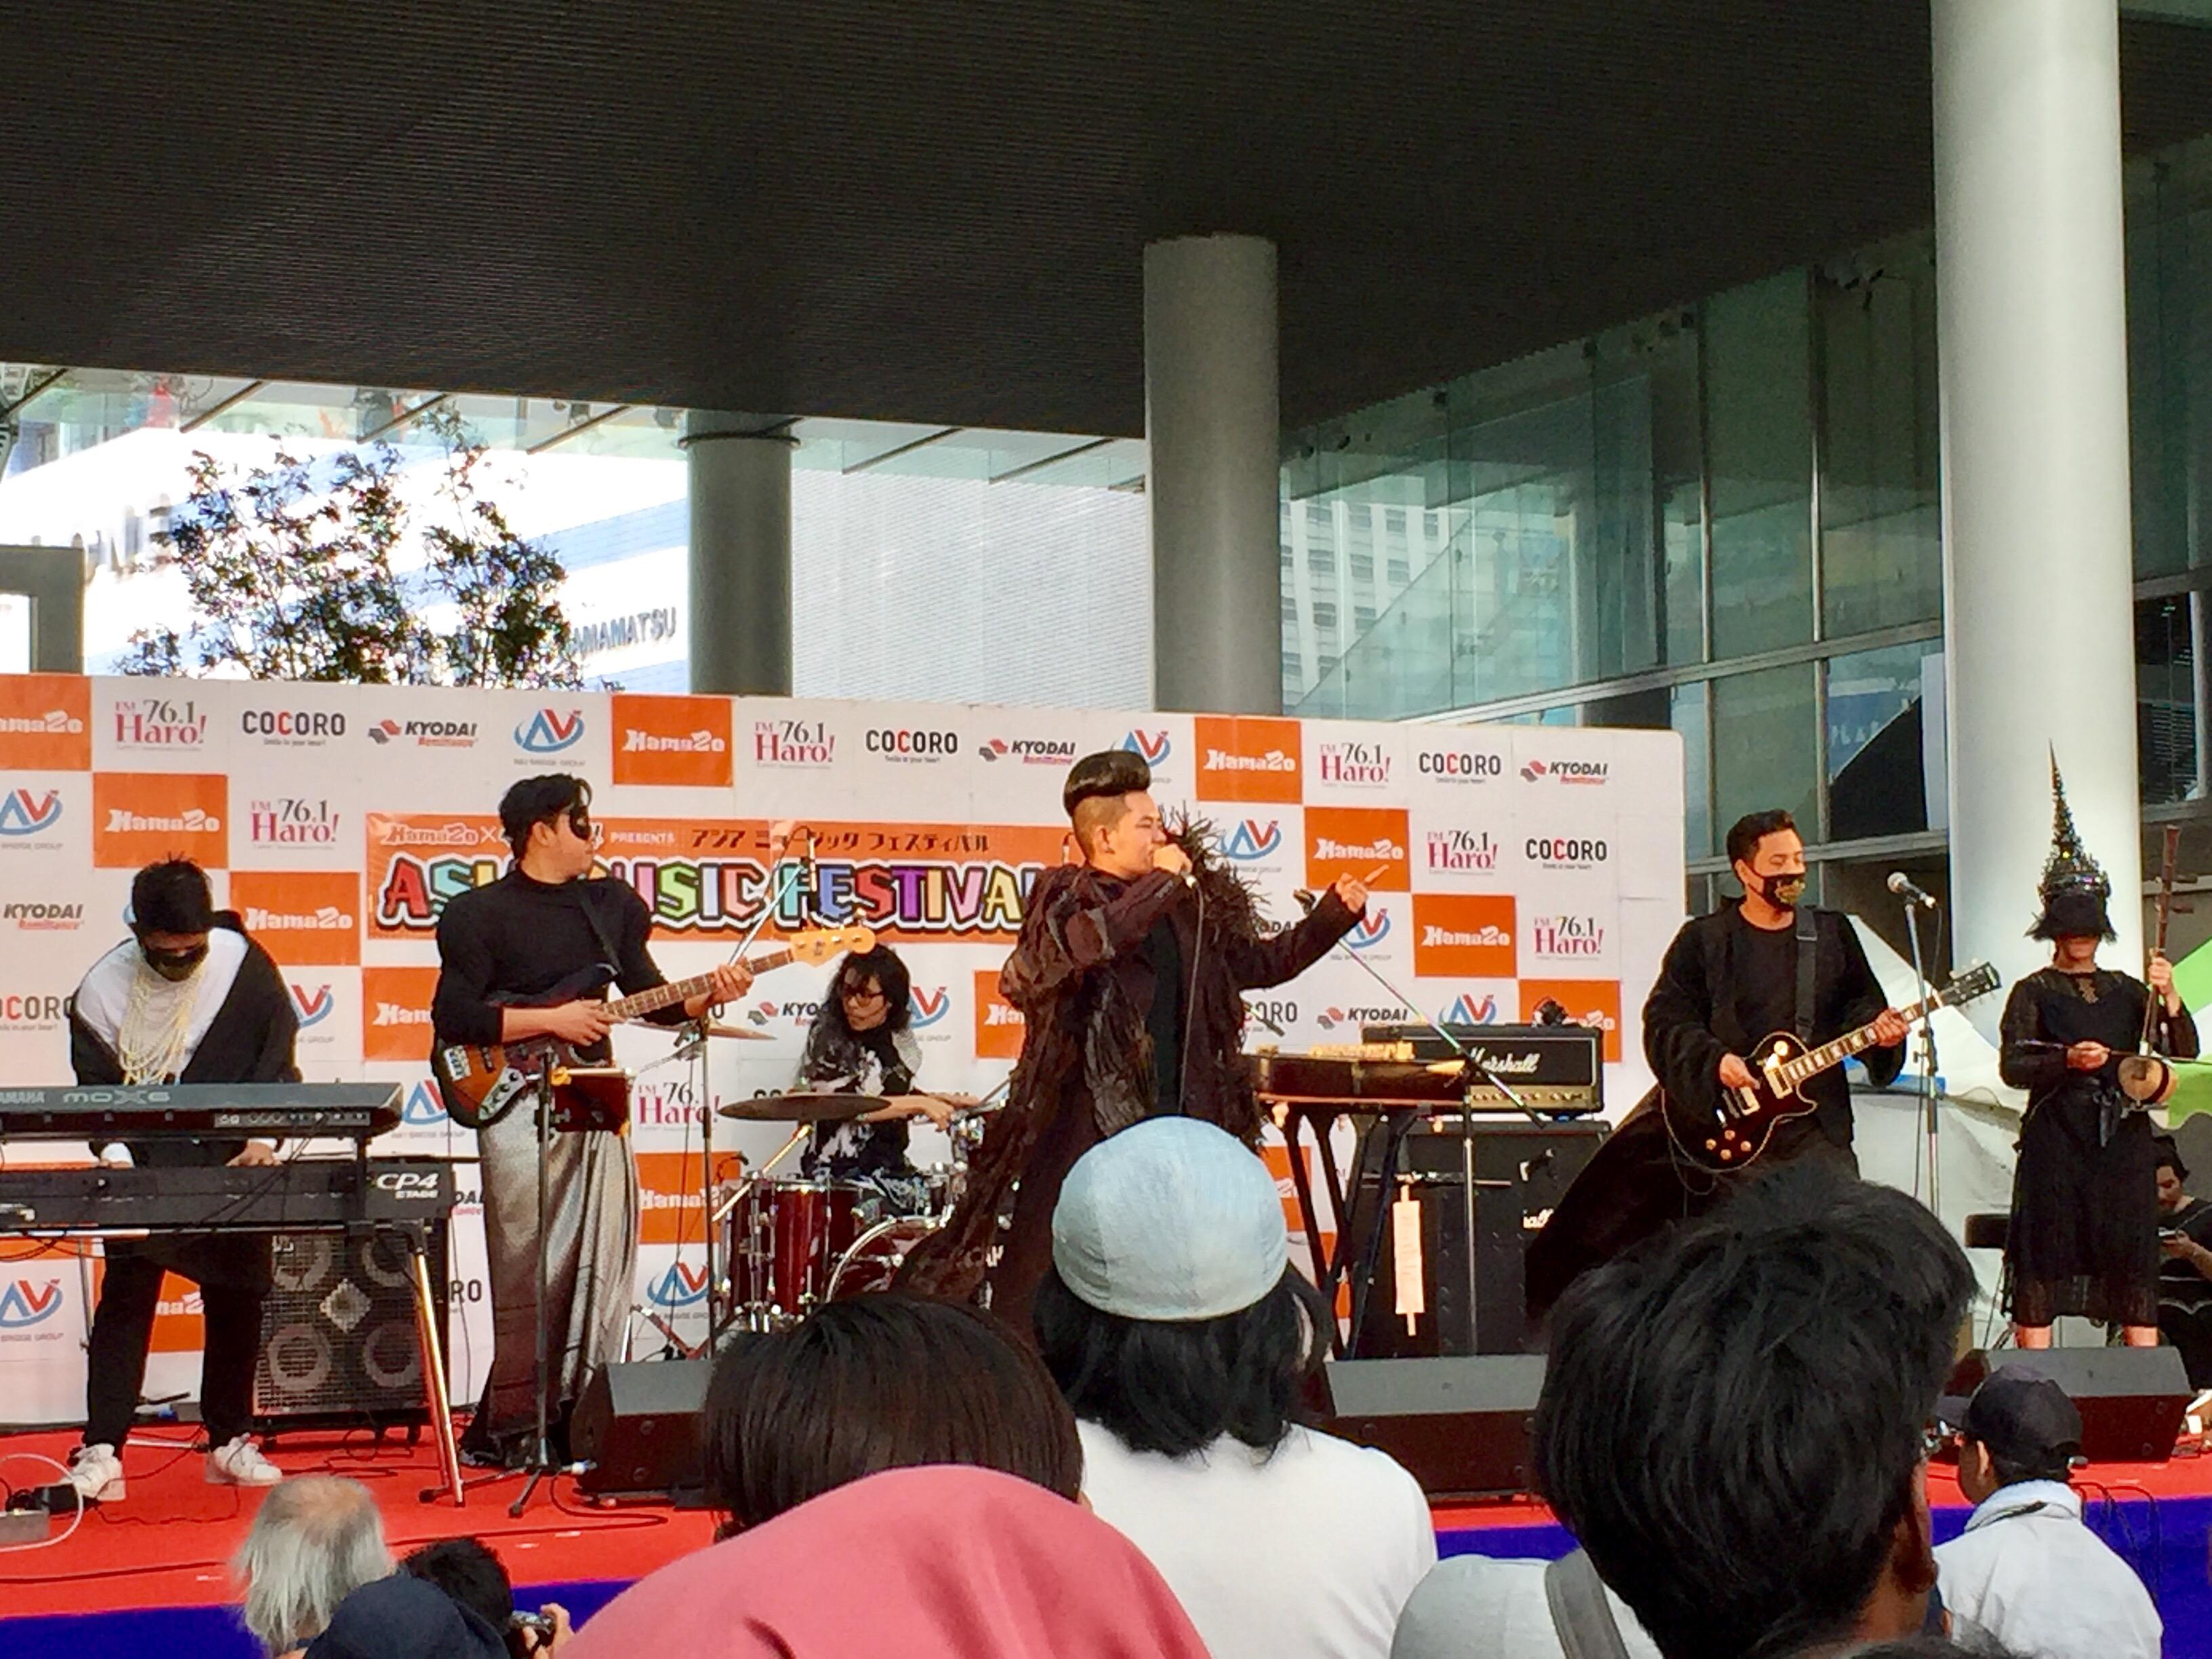 ASIA MUSIC FESTIVAL 2017